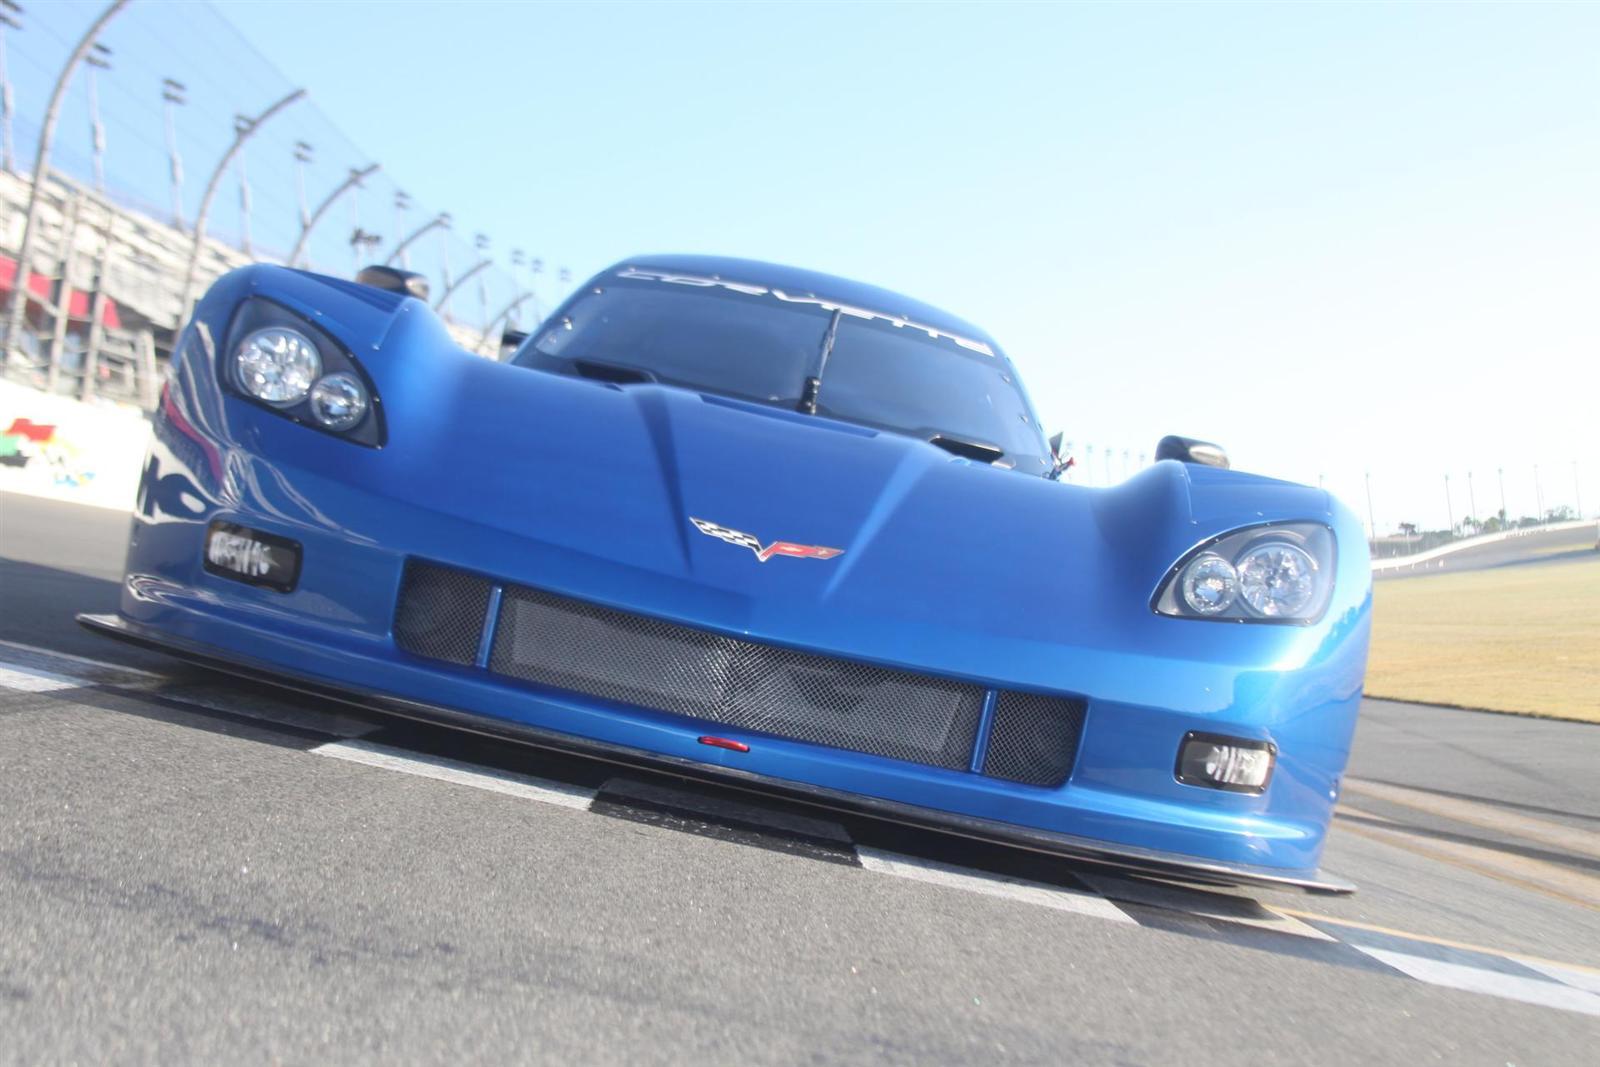 2012 Chevrolet Corvette Daytona Prototype